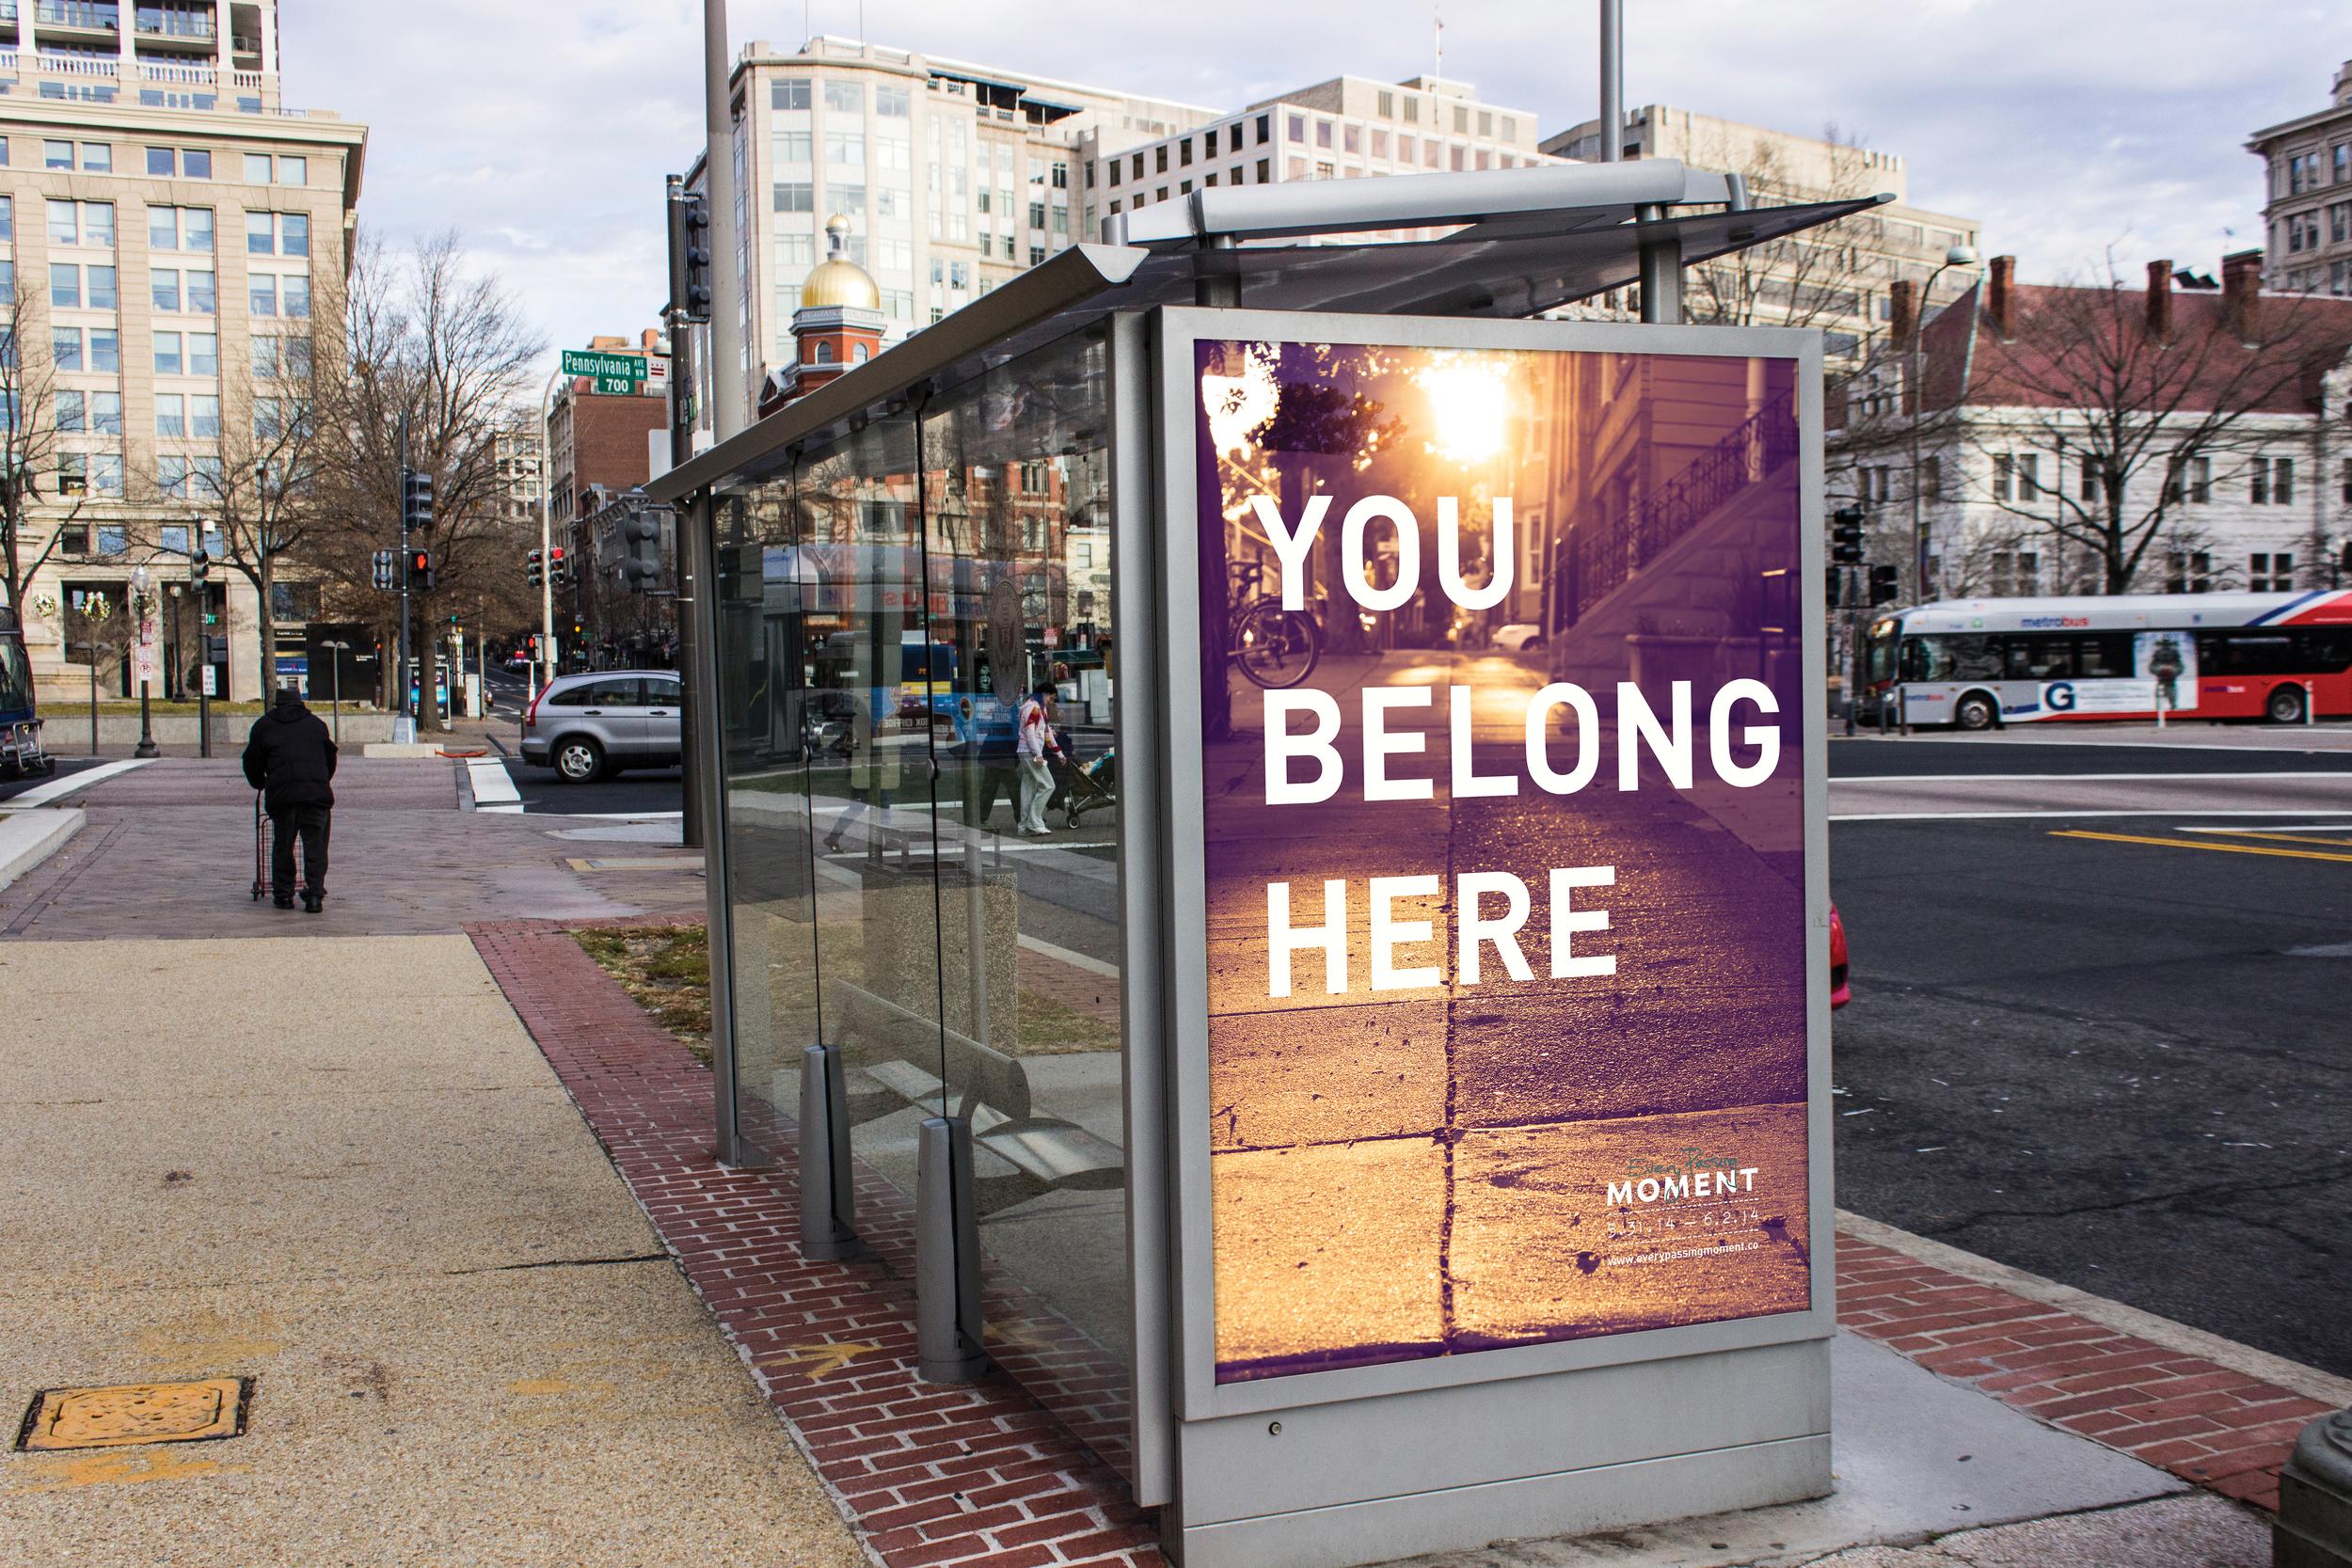 Bus Stop Ad_belong.jpg